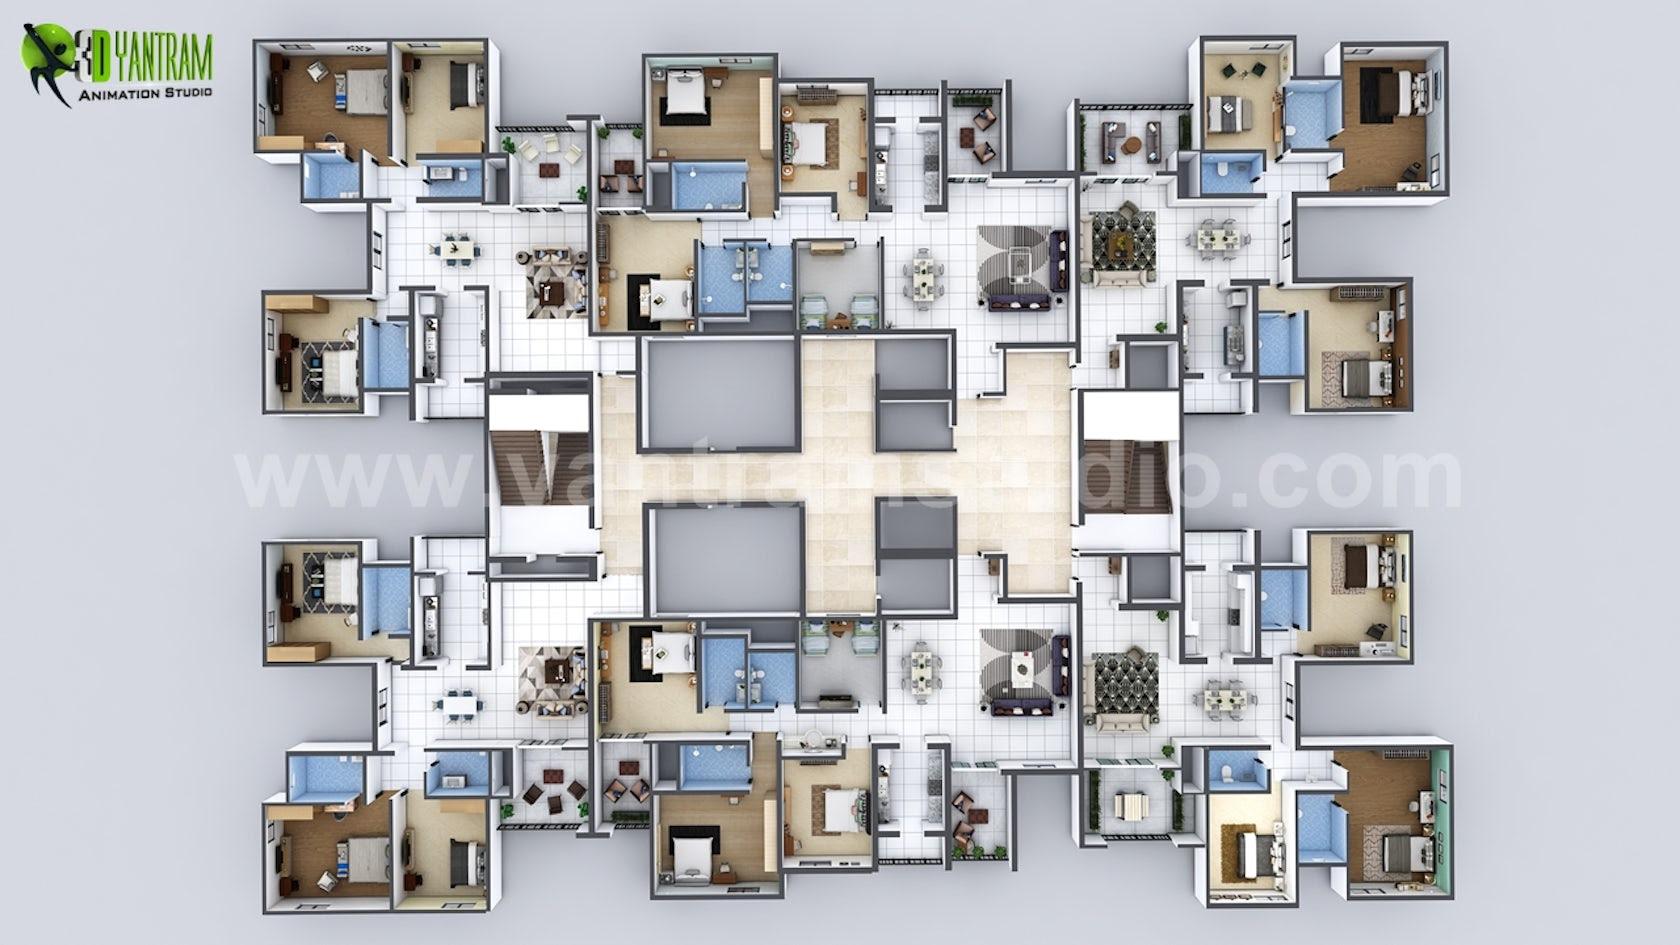 Creative 22D Floor Plan of Entire Apartment Floor Design on Architizer